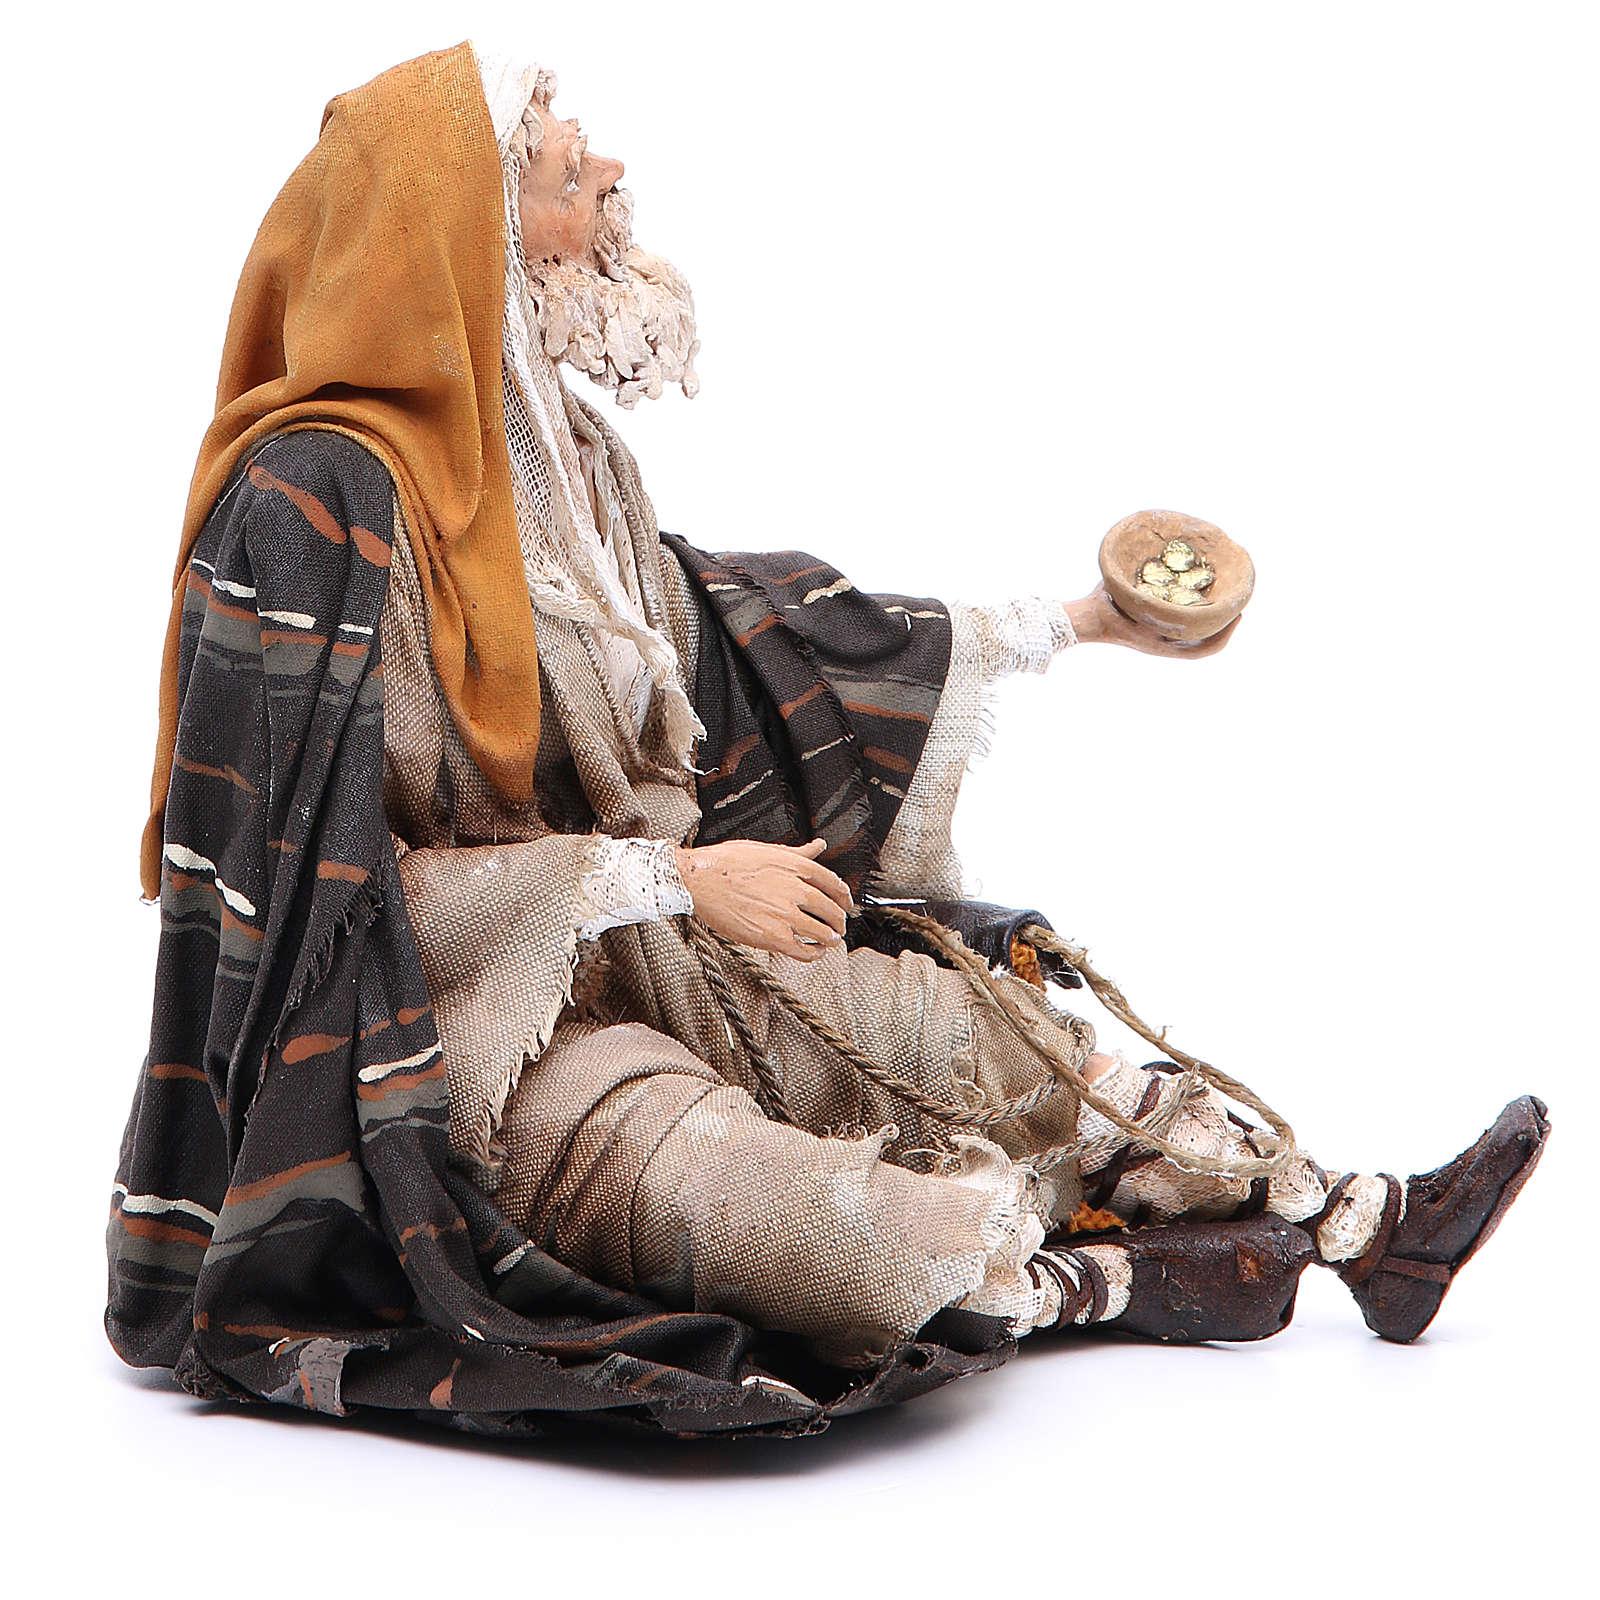 Mendicante 30 cm Angela Tripi terracotta 4